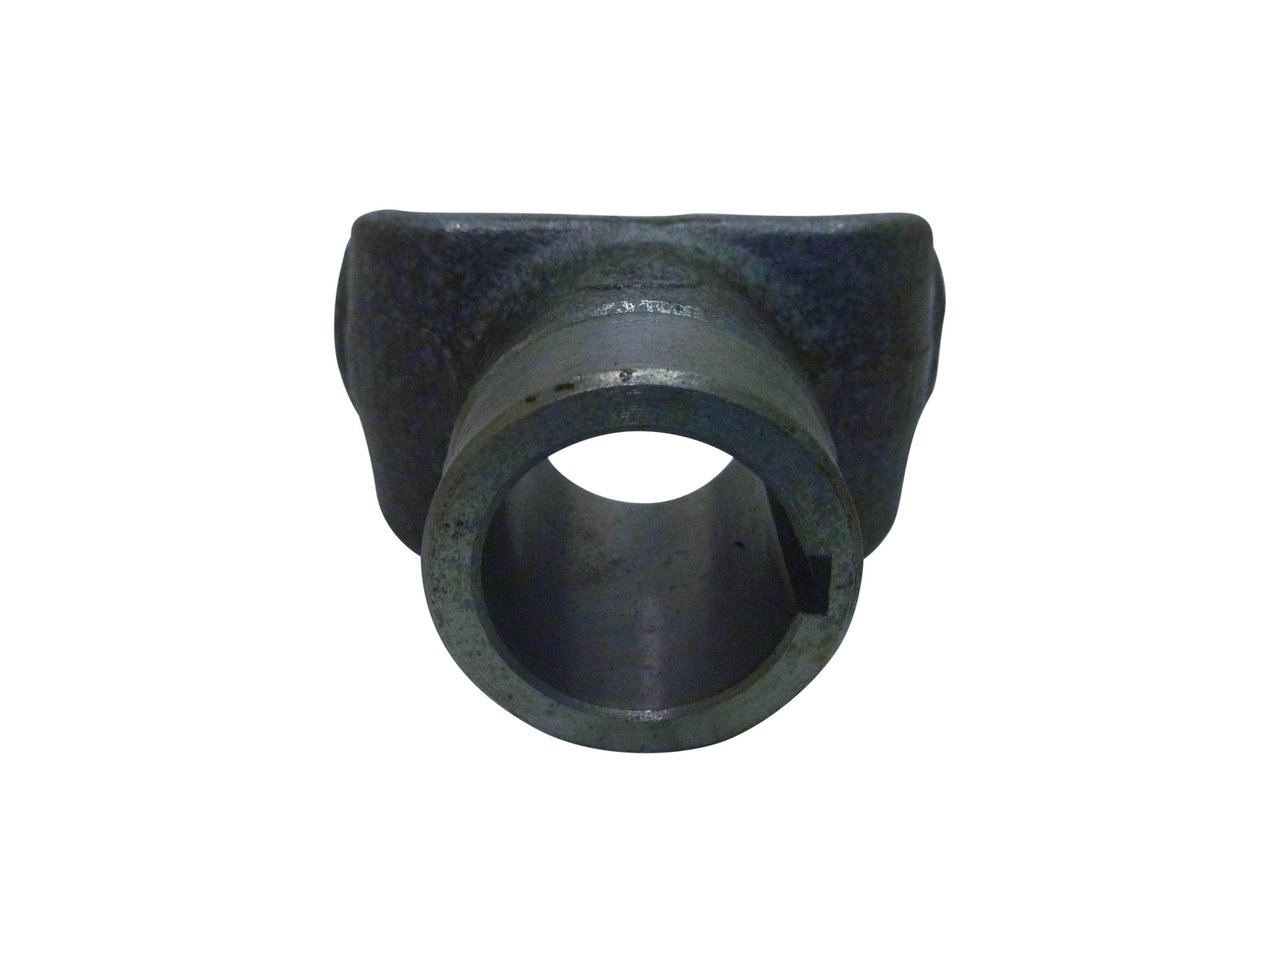 Pto Drive Shaft Universal Joints : Pto driveshaft uj yoke suitable for landcruiser series